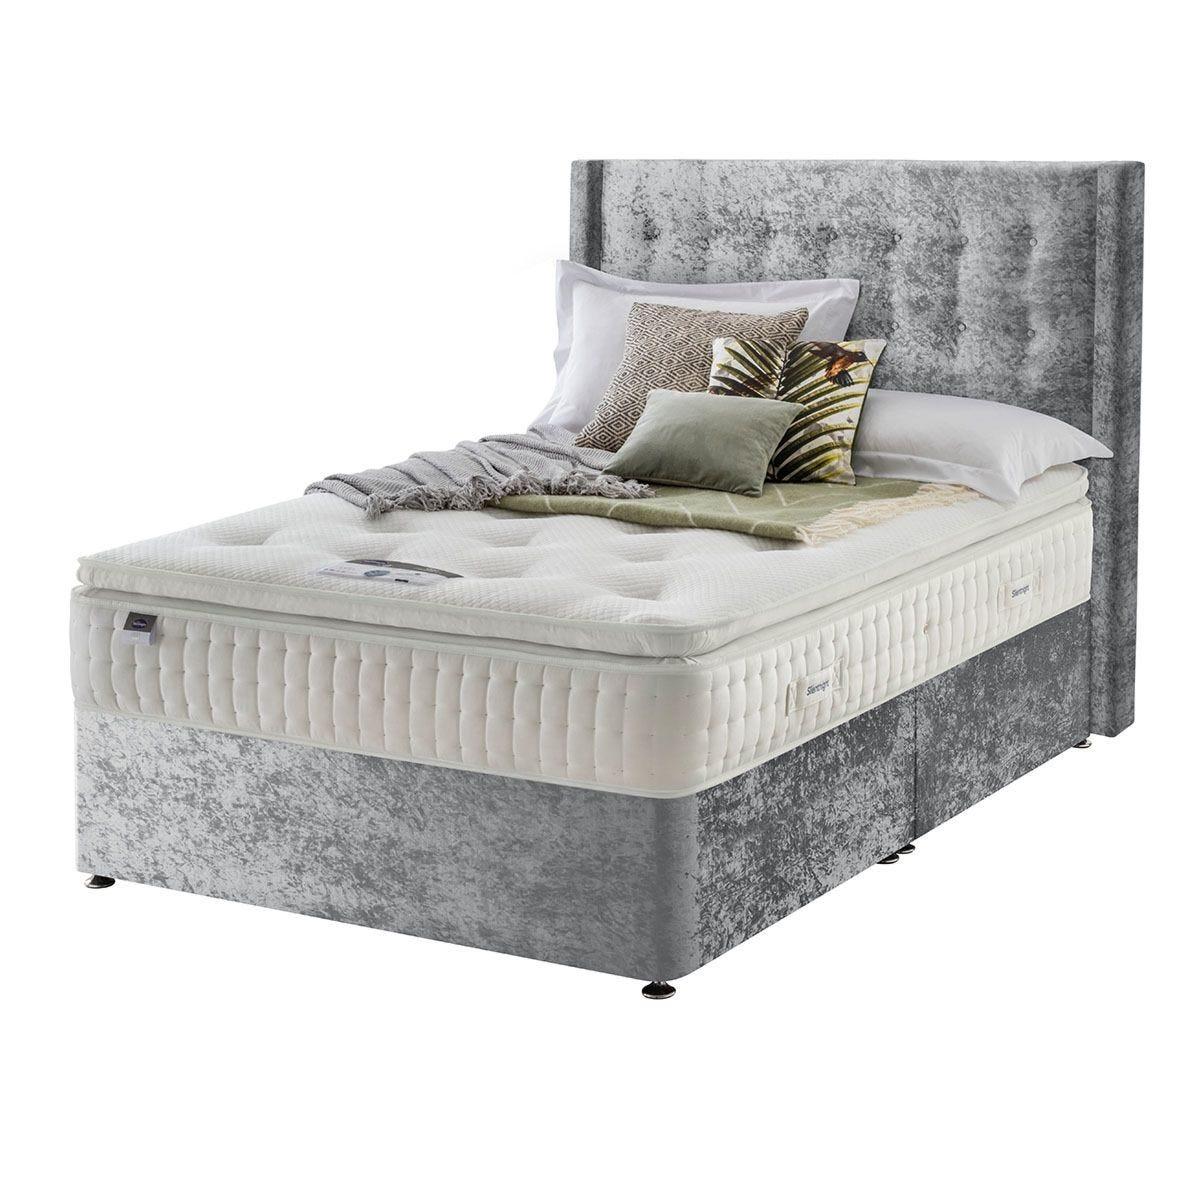 Silentnight Mirapocket Latex 1400 Non Storage Divan Bed - Crushed Velvet Light Grey